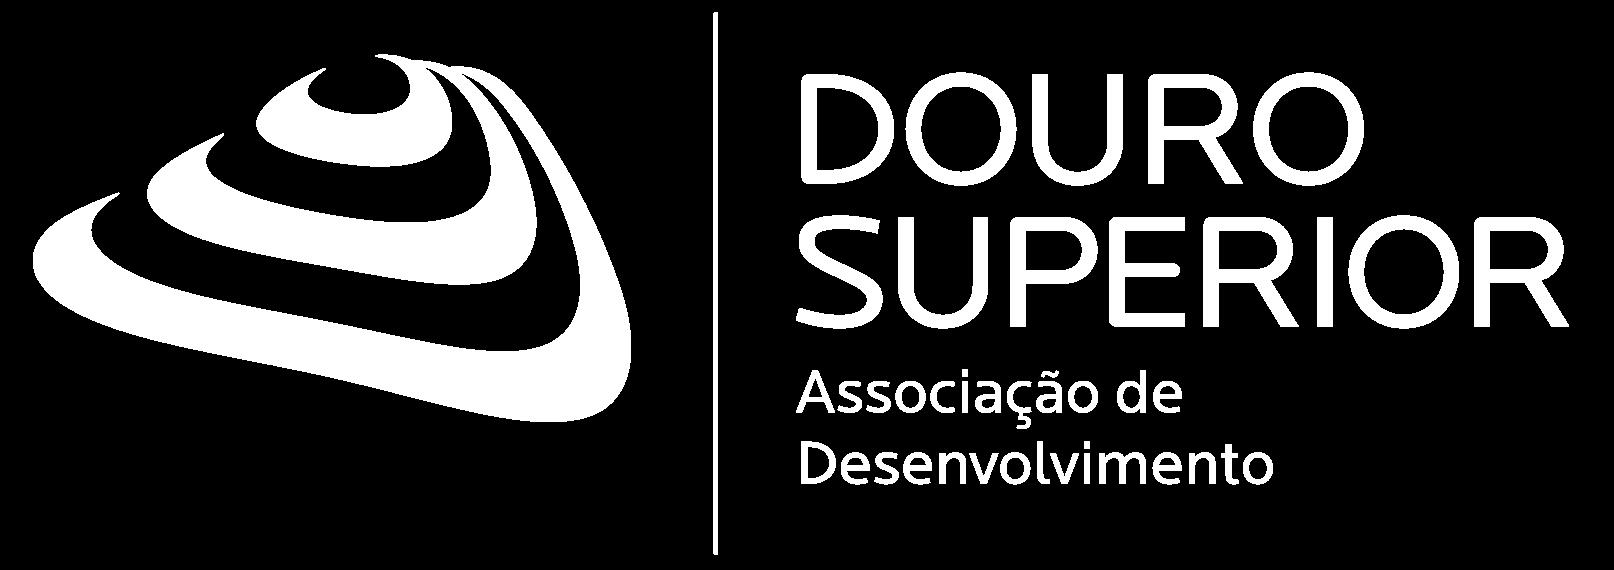 DOUROSUPERIOR